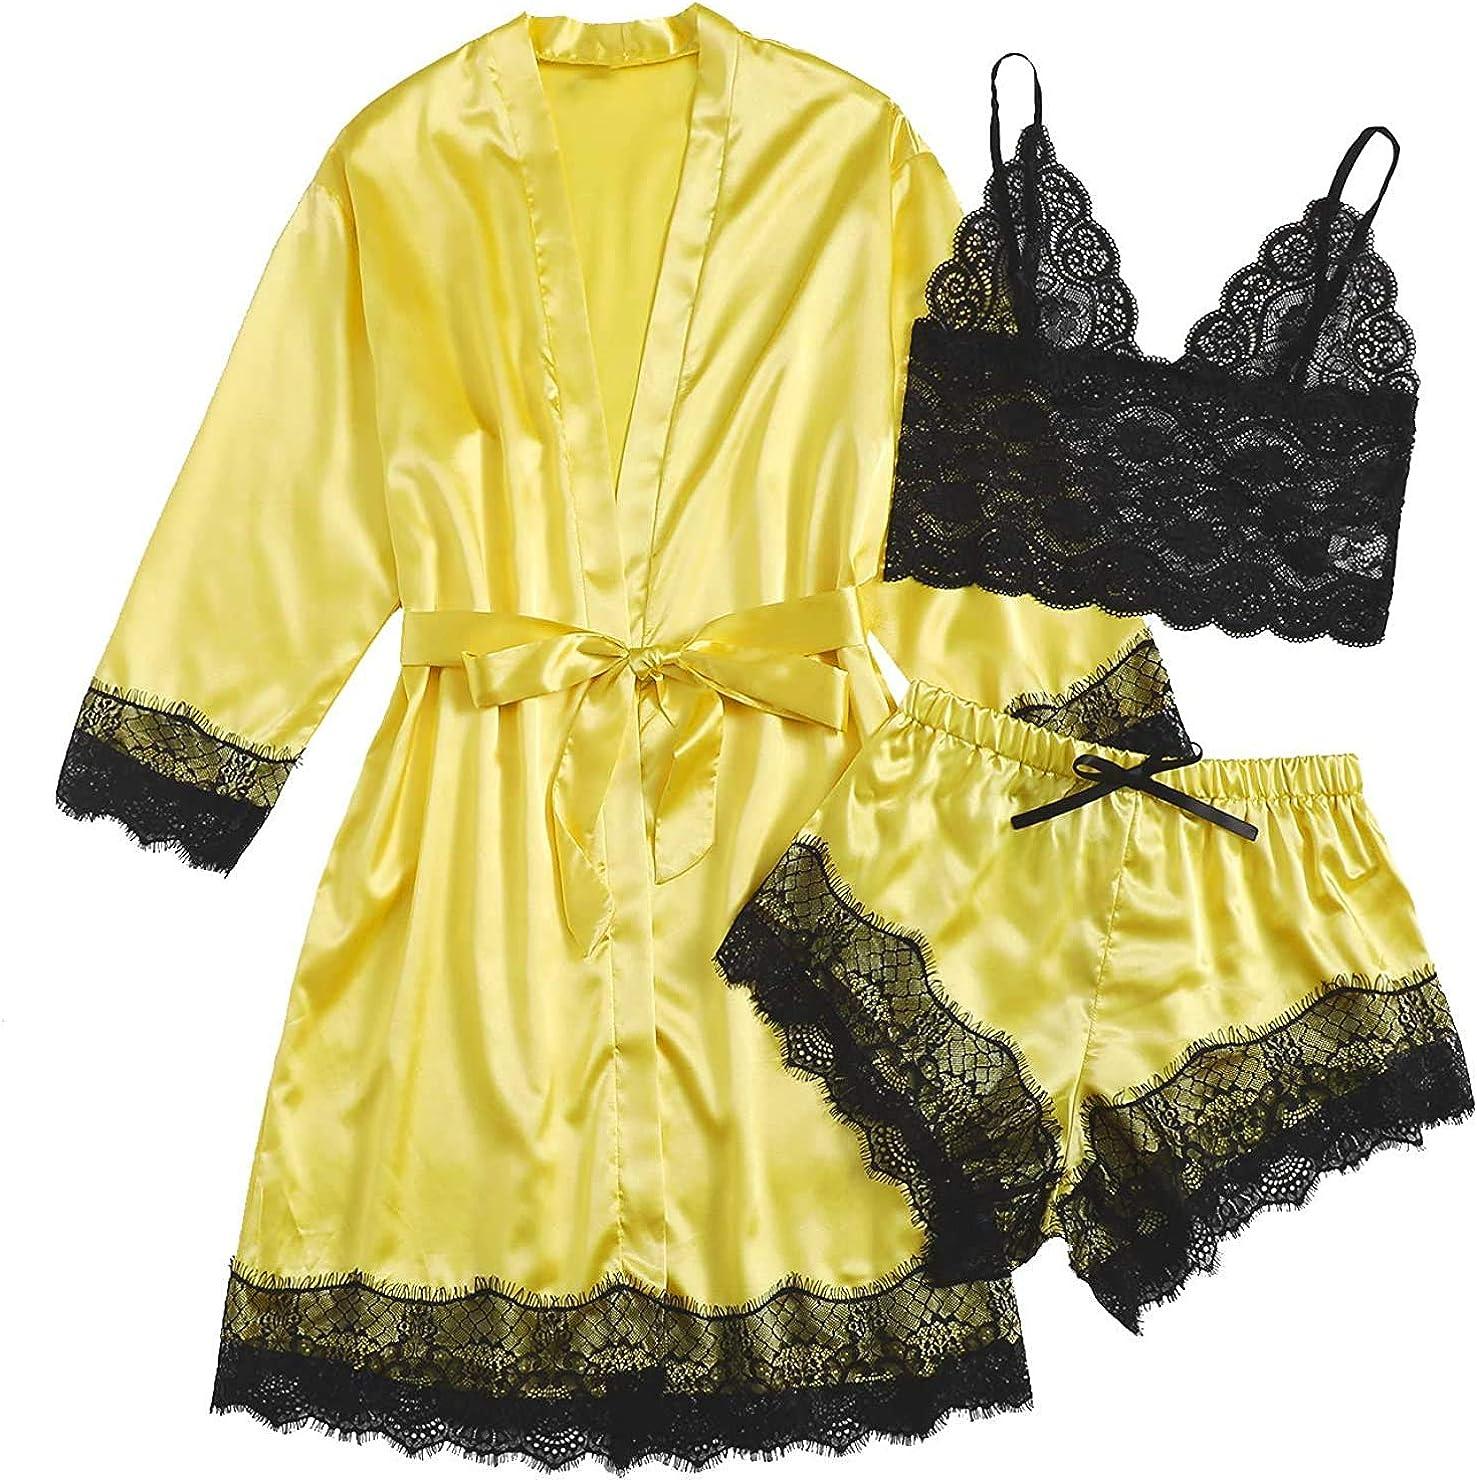 3/4/5 PCS Women's Sleepwear Plus Size Silk Sexy Nightwear Lace Trim Satin Nightgown Cami Pajamas Set with Robe